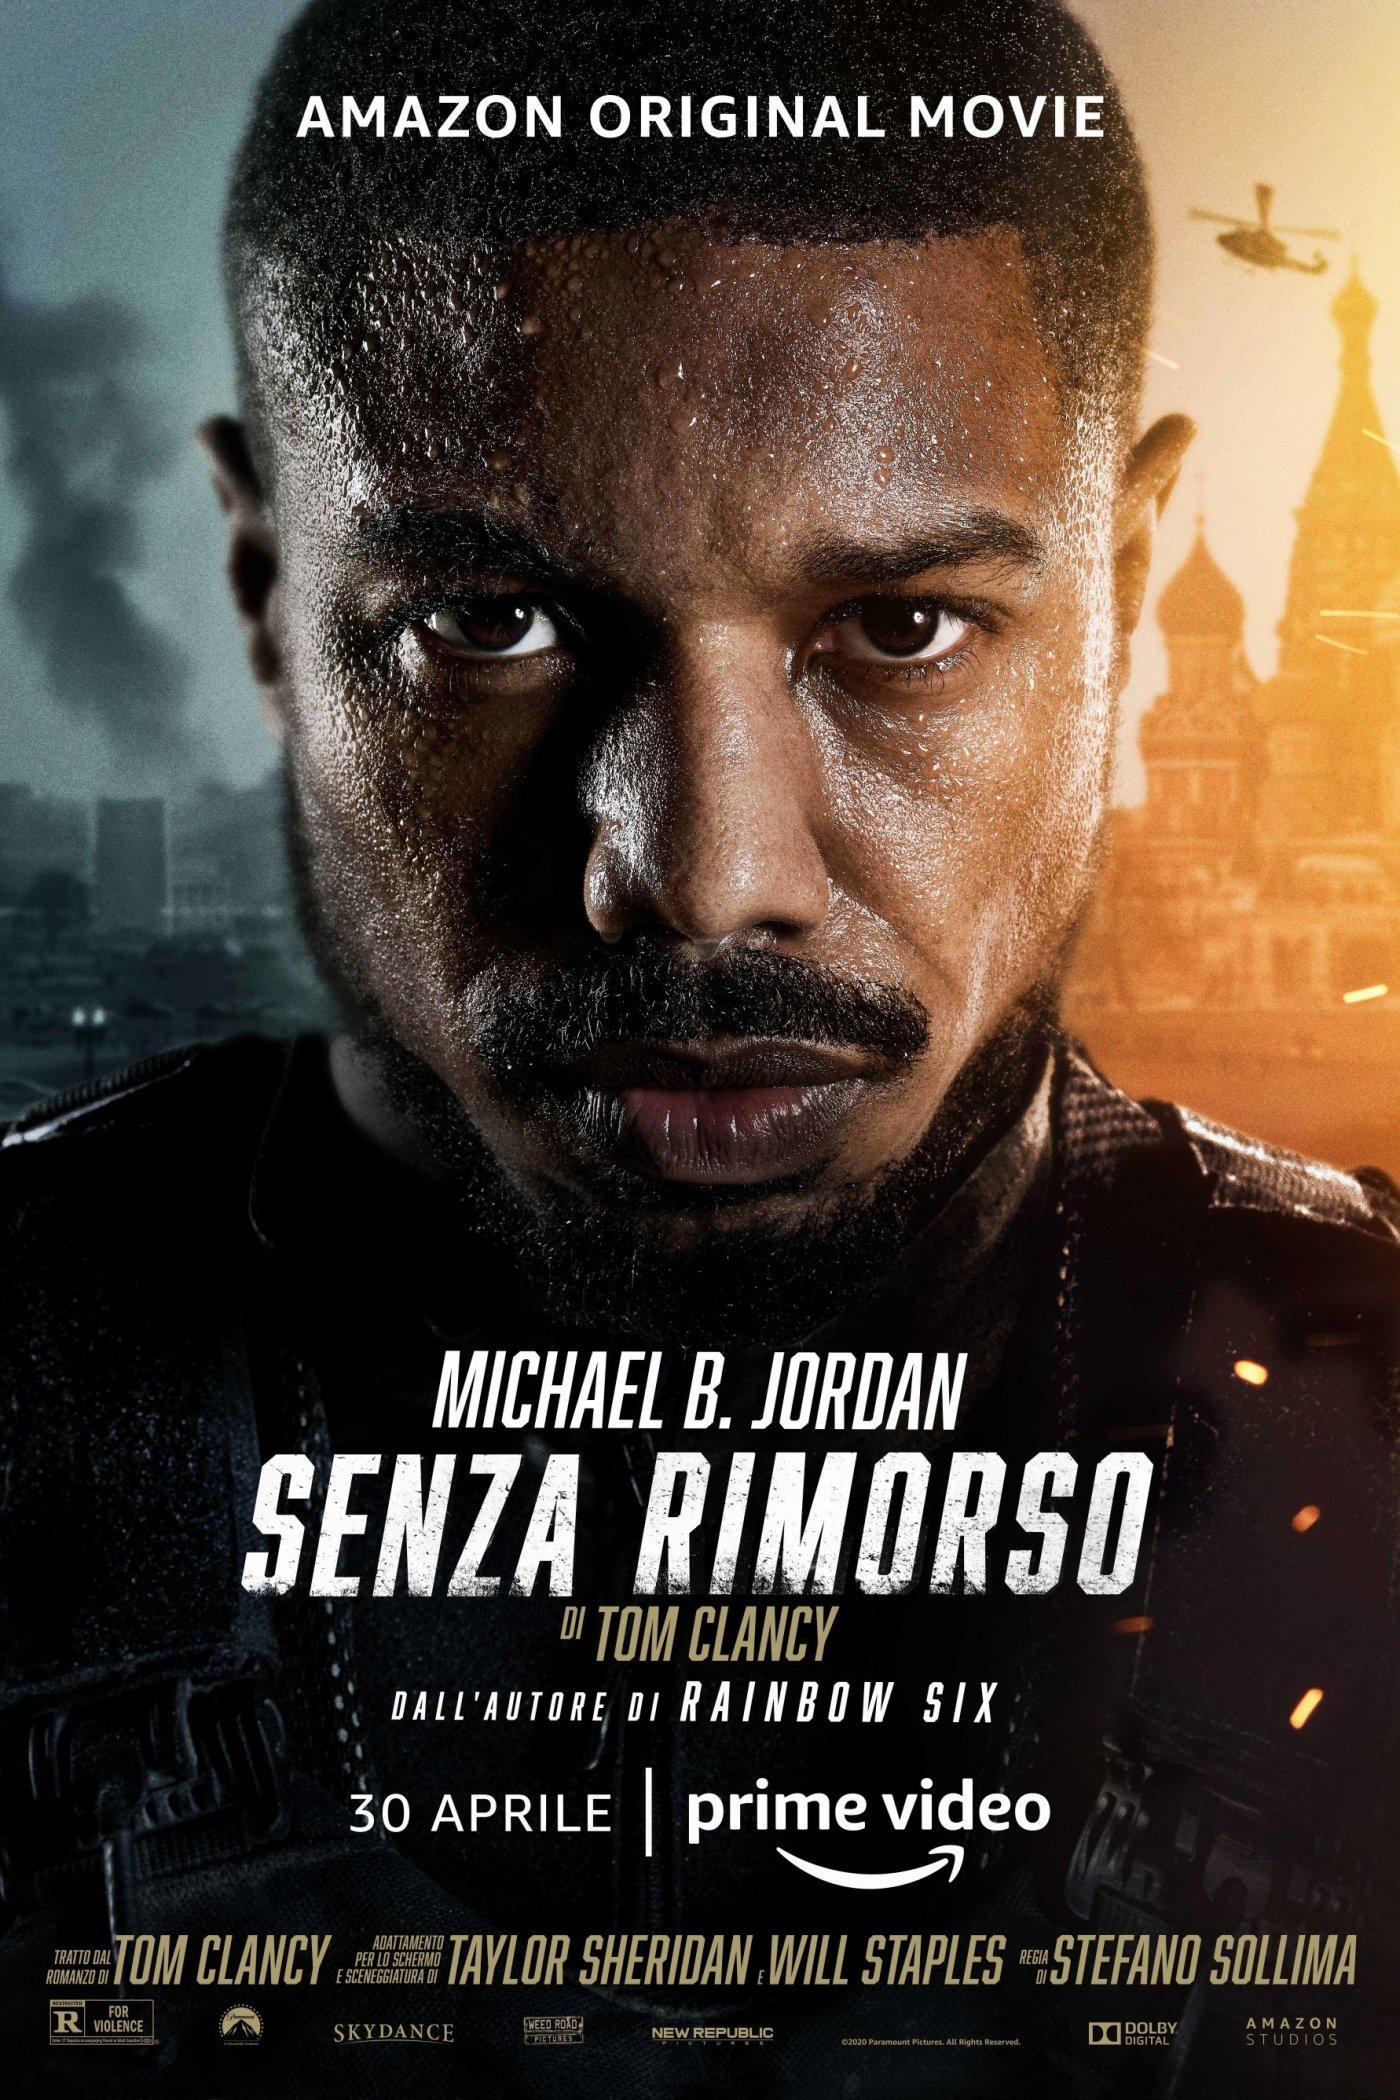 https://movieplayer.it/film/senza-rimorso_50235/